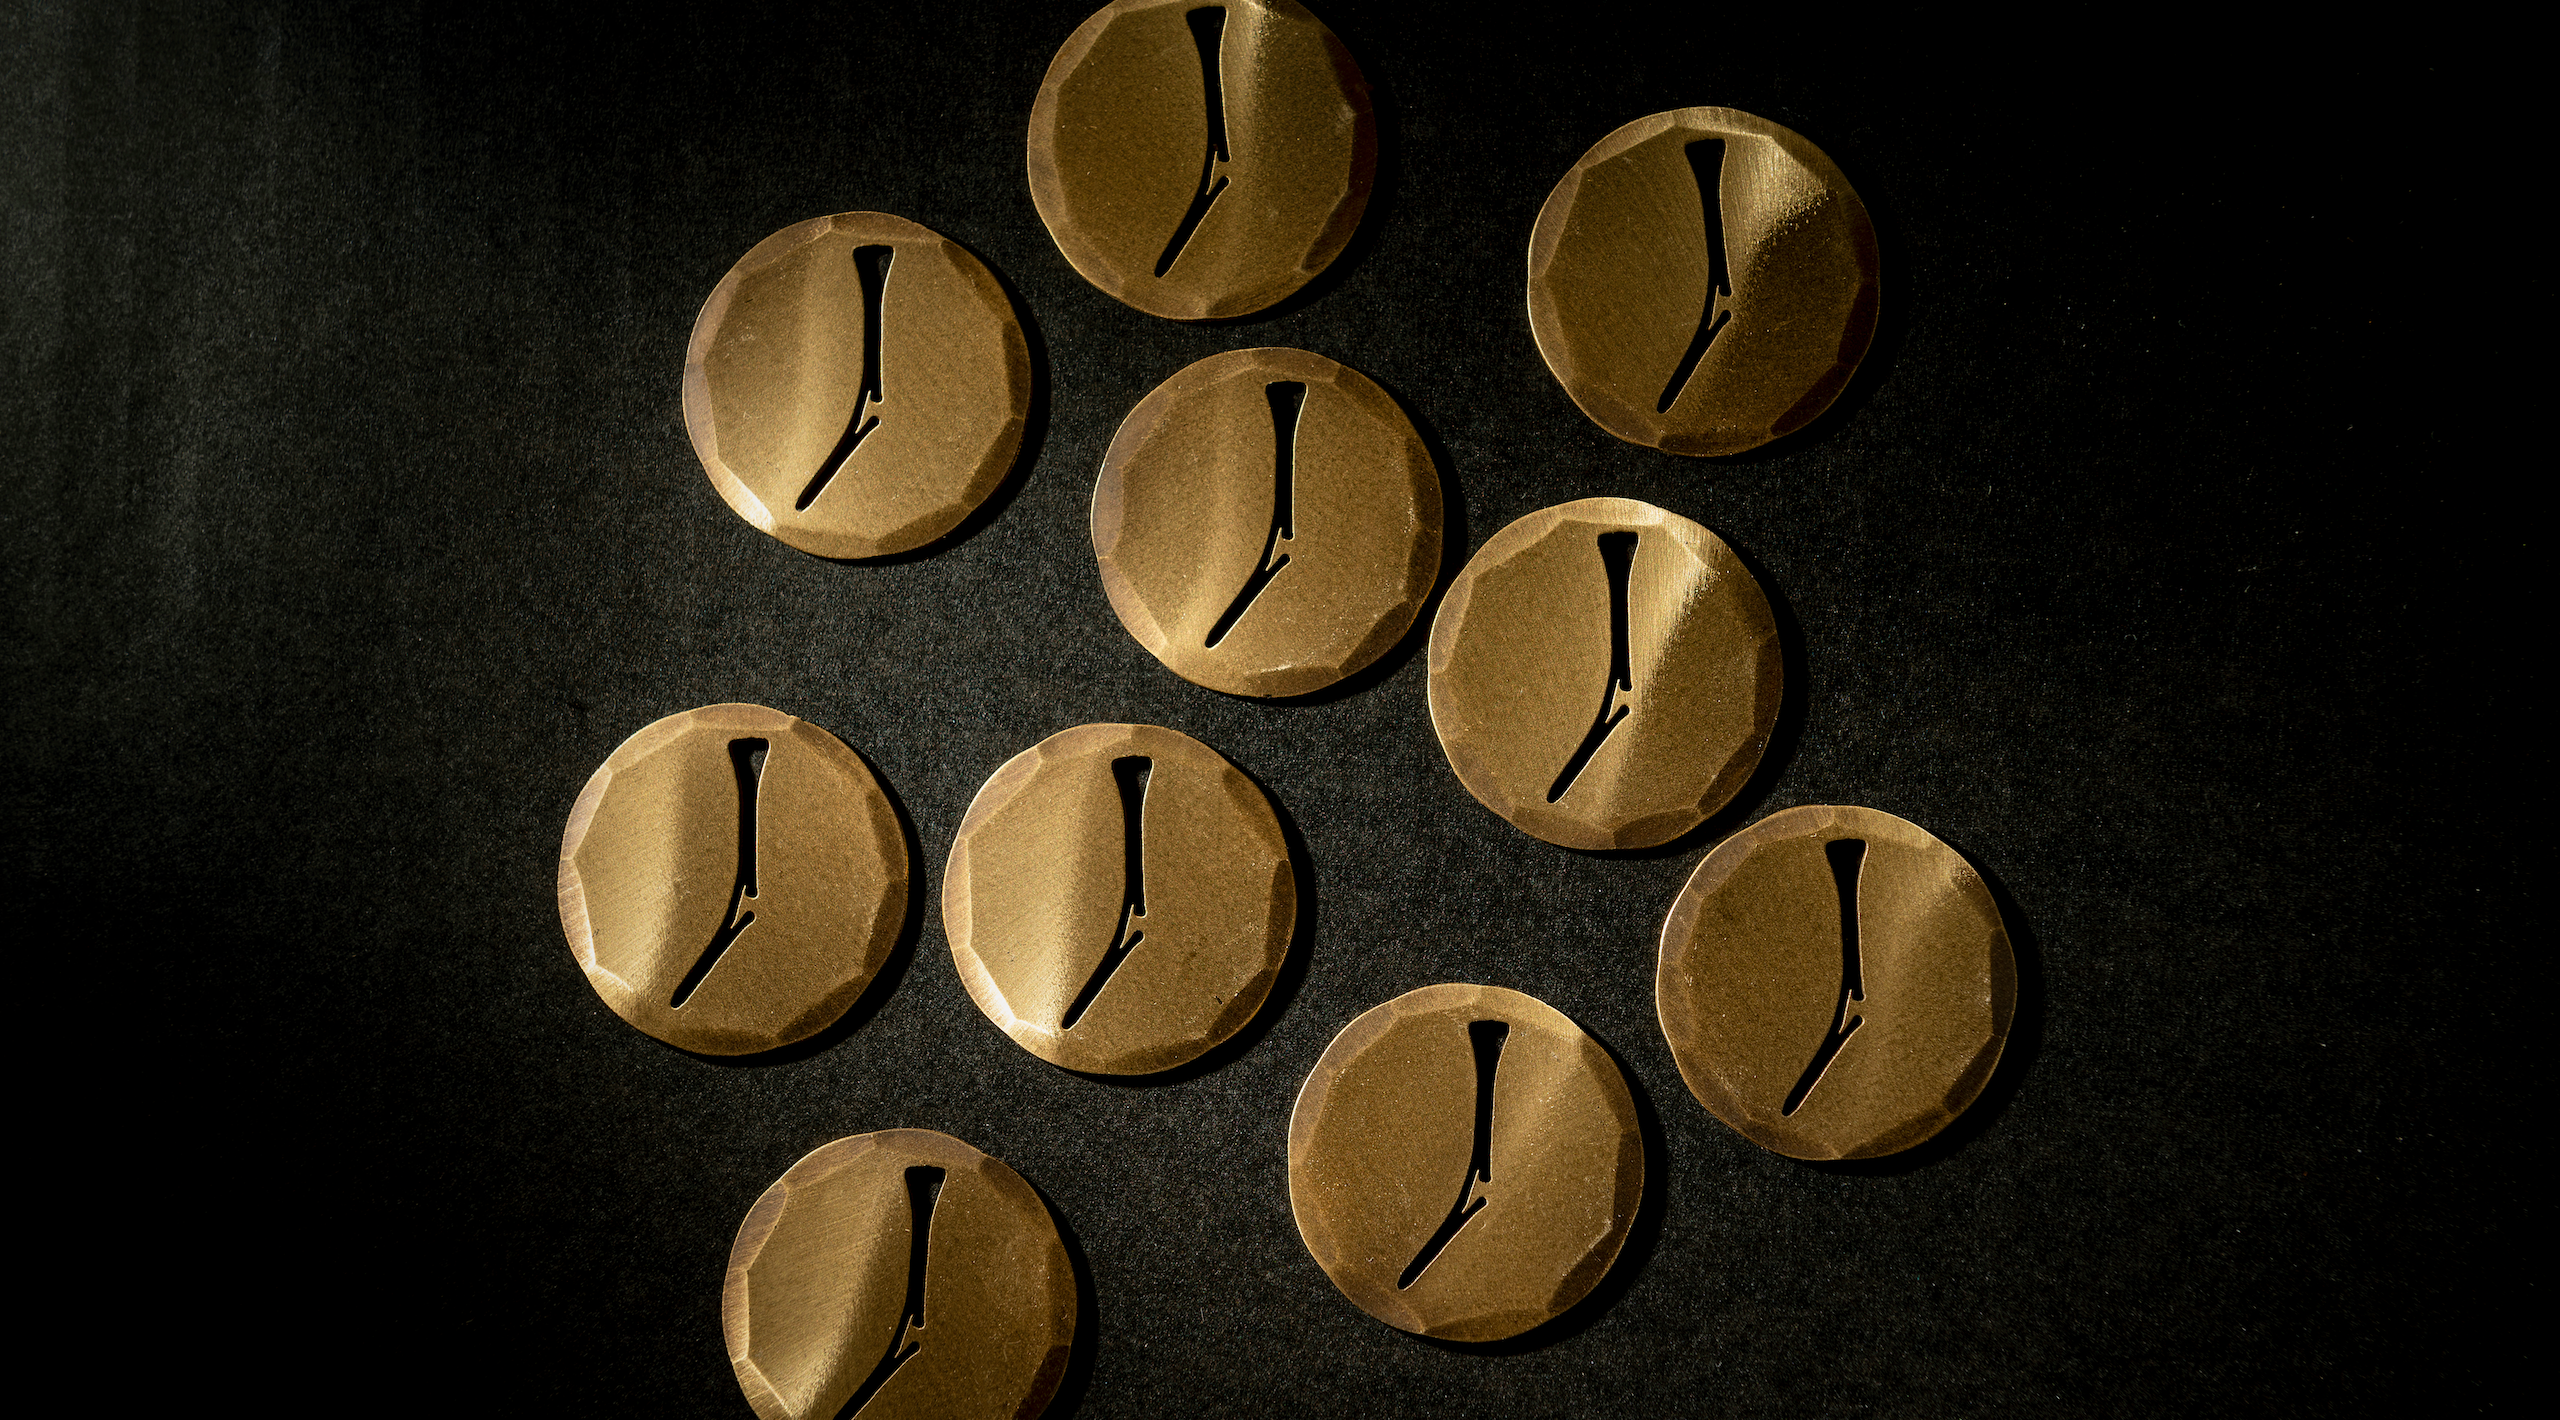 The Gold Medal Ball Mark